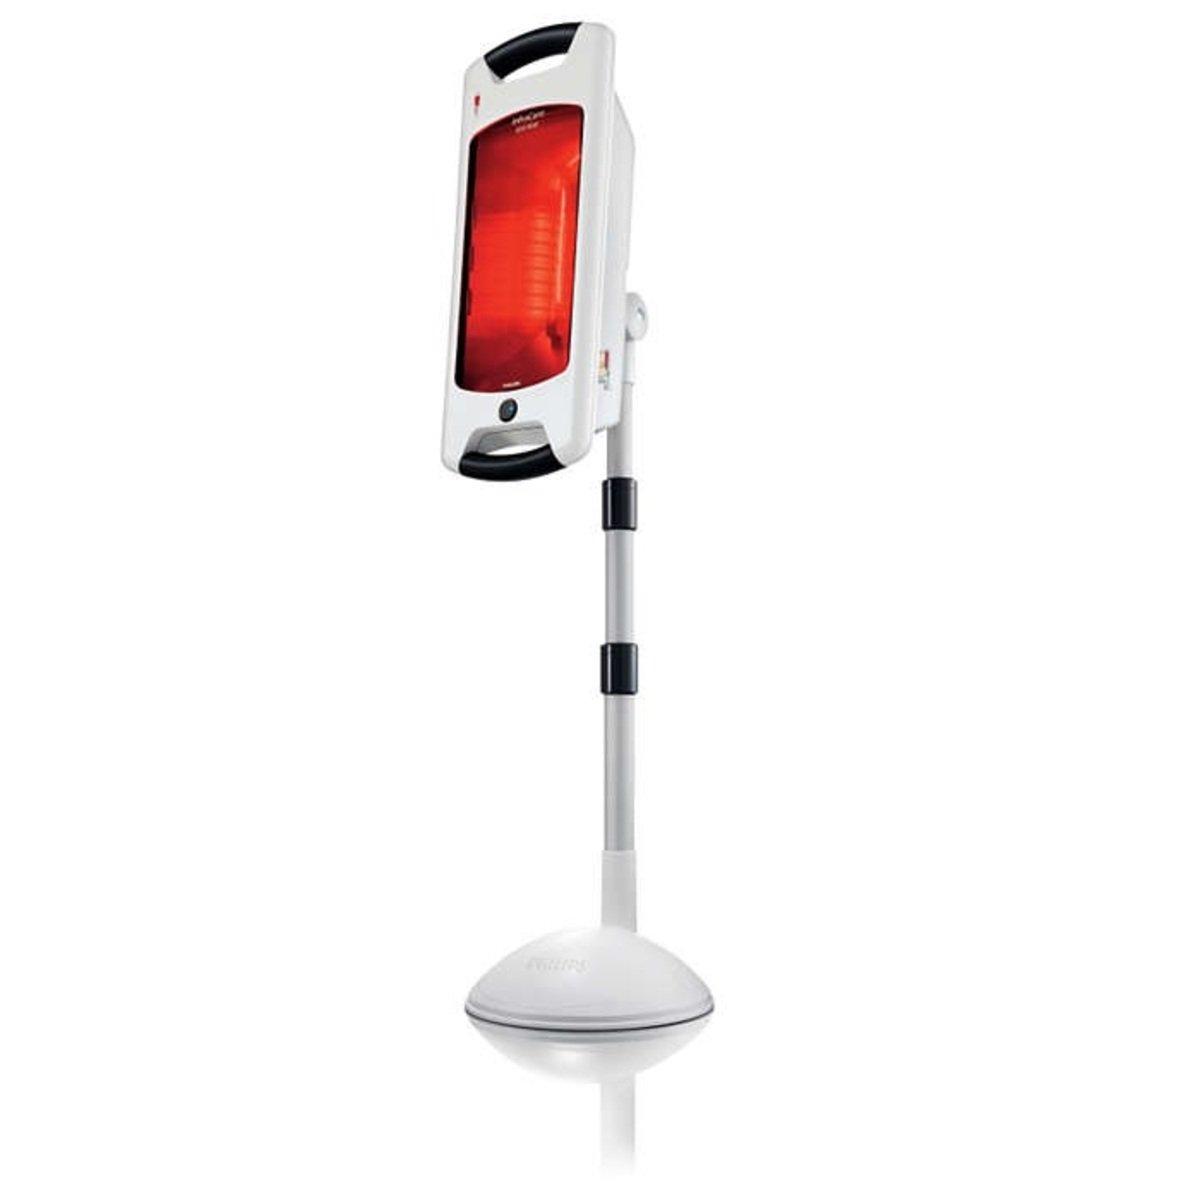 HP3643 Infra Care 紅外線燈管